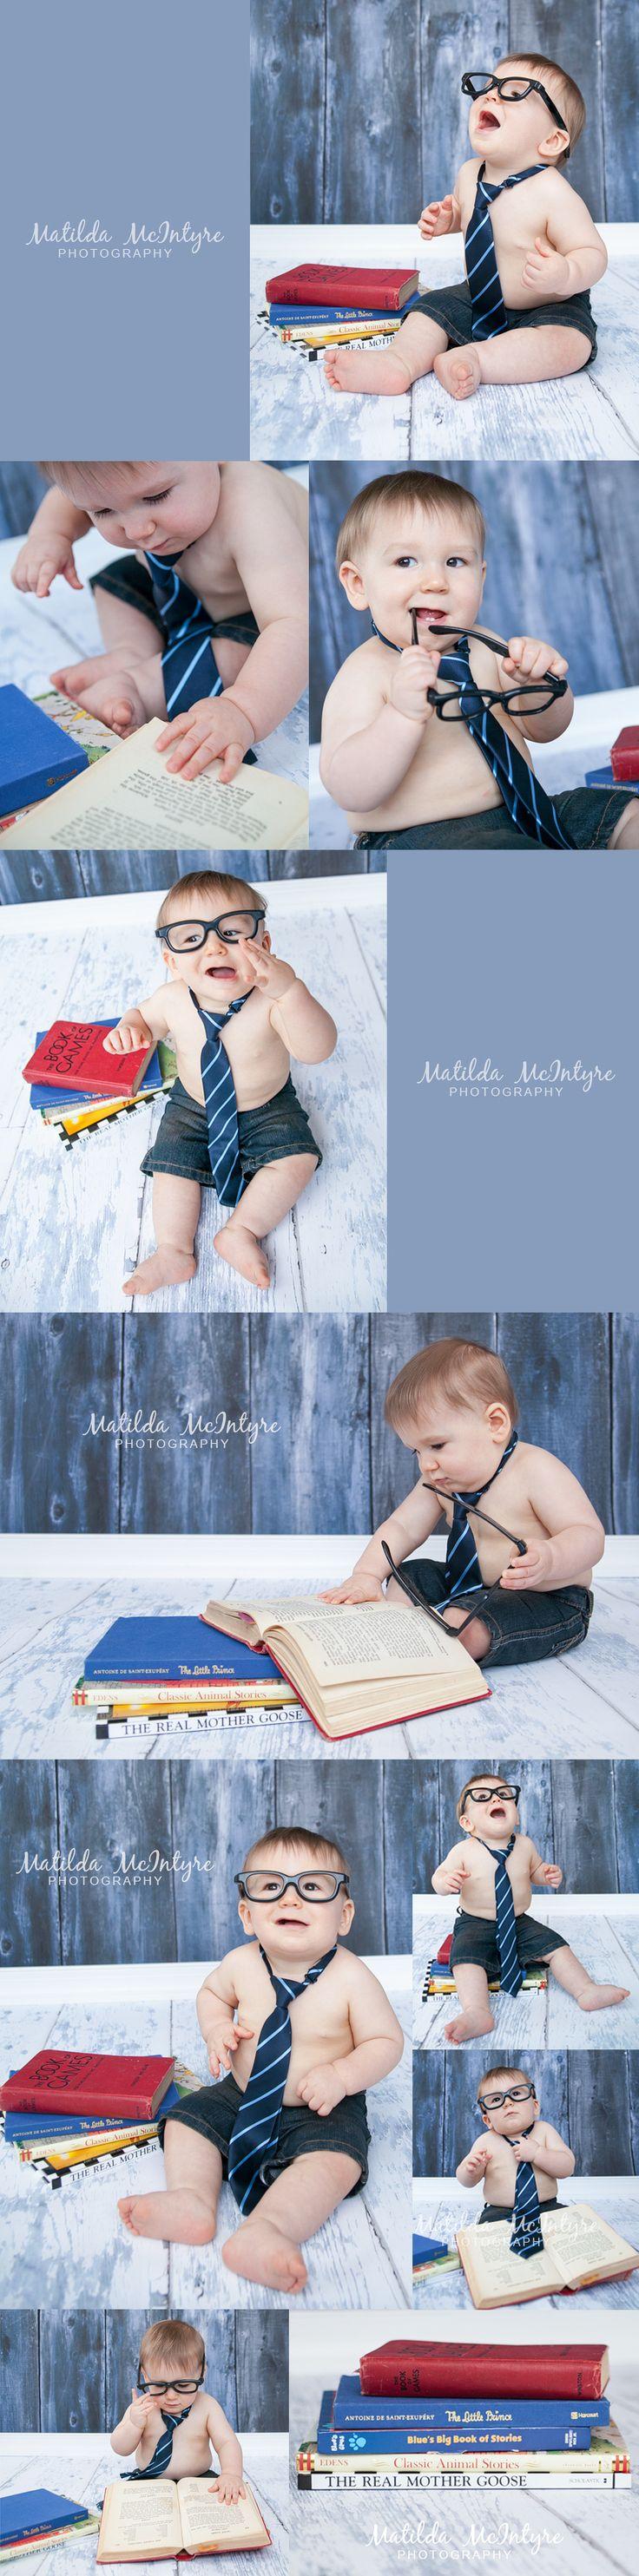 45 Best Photo Ideas Images On Pinterest Baby Photos